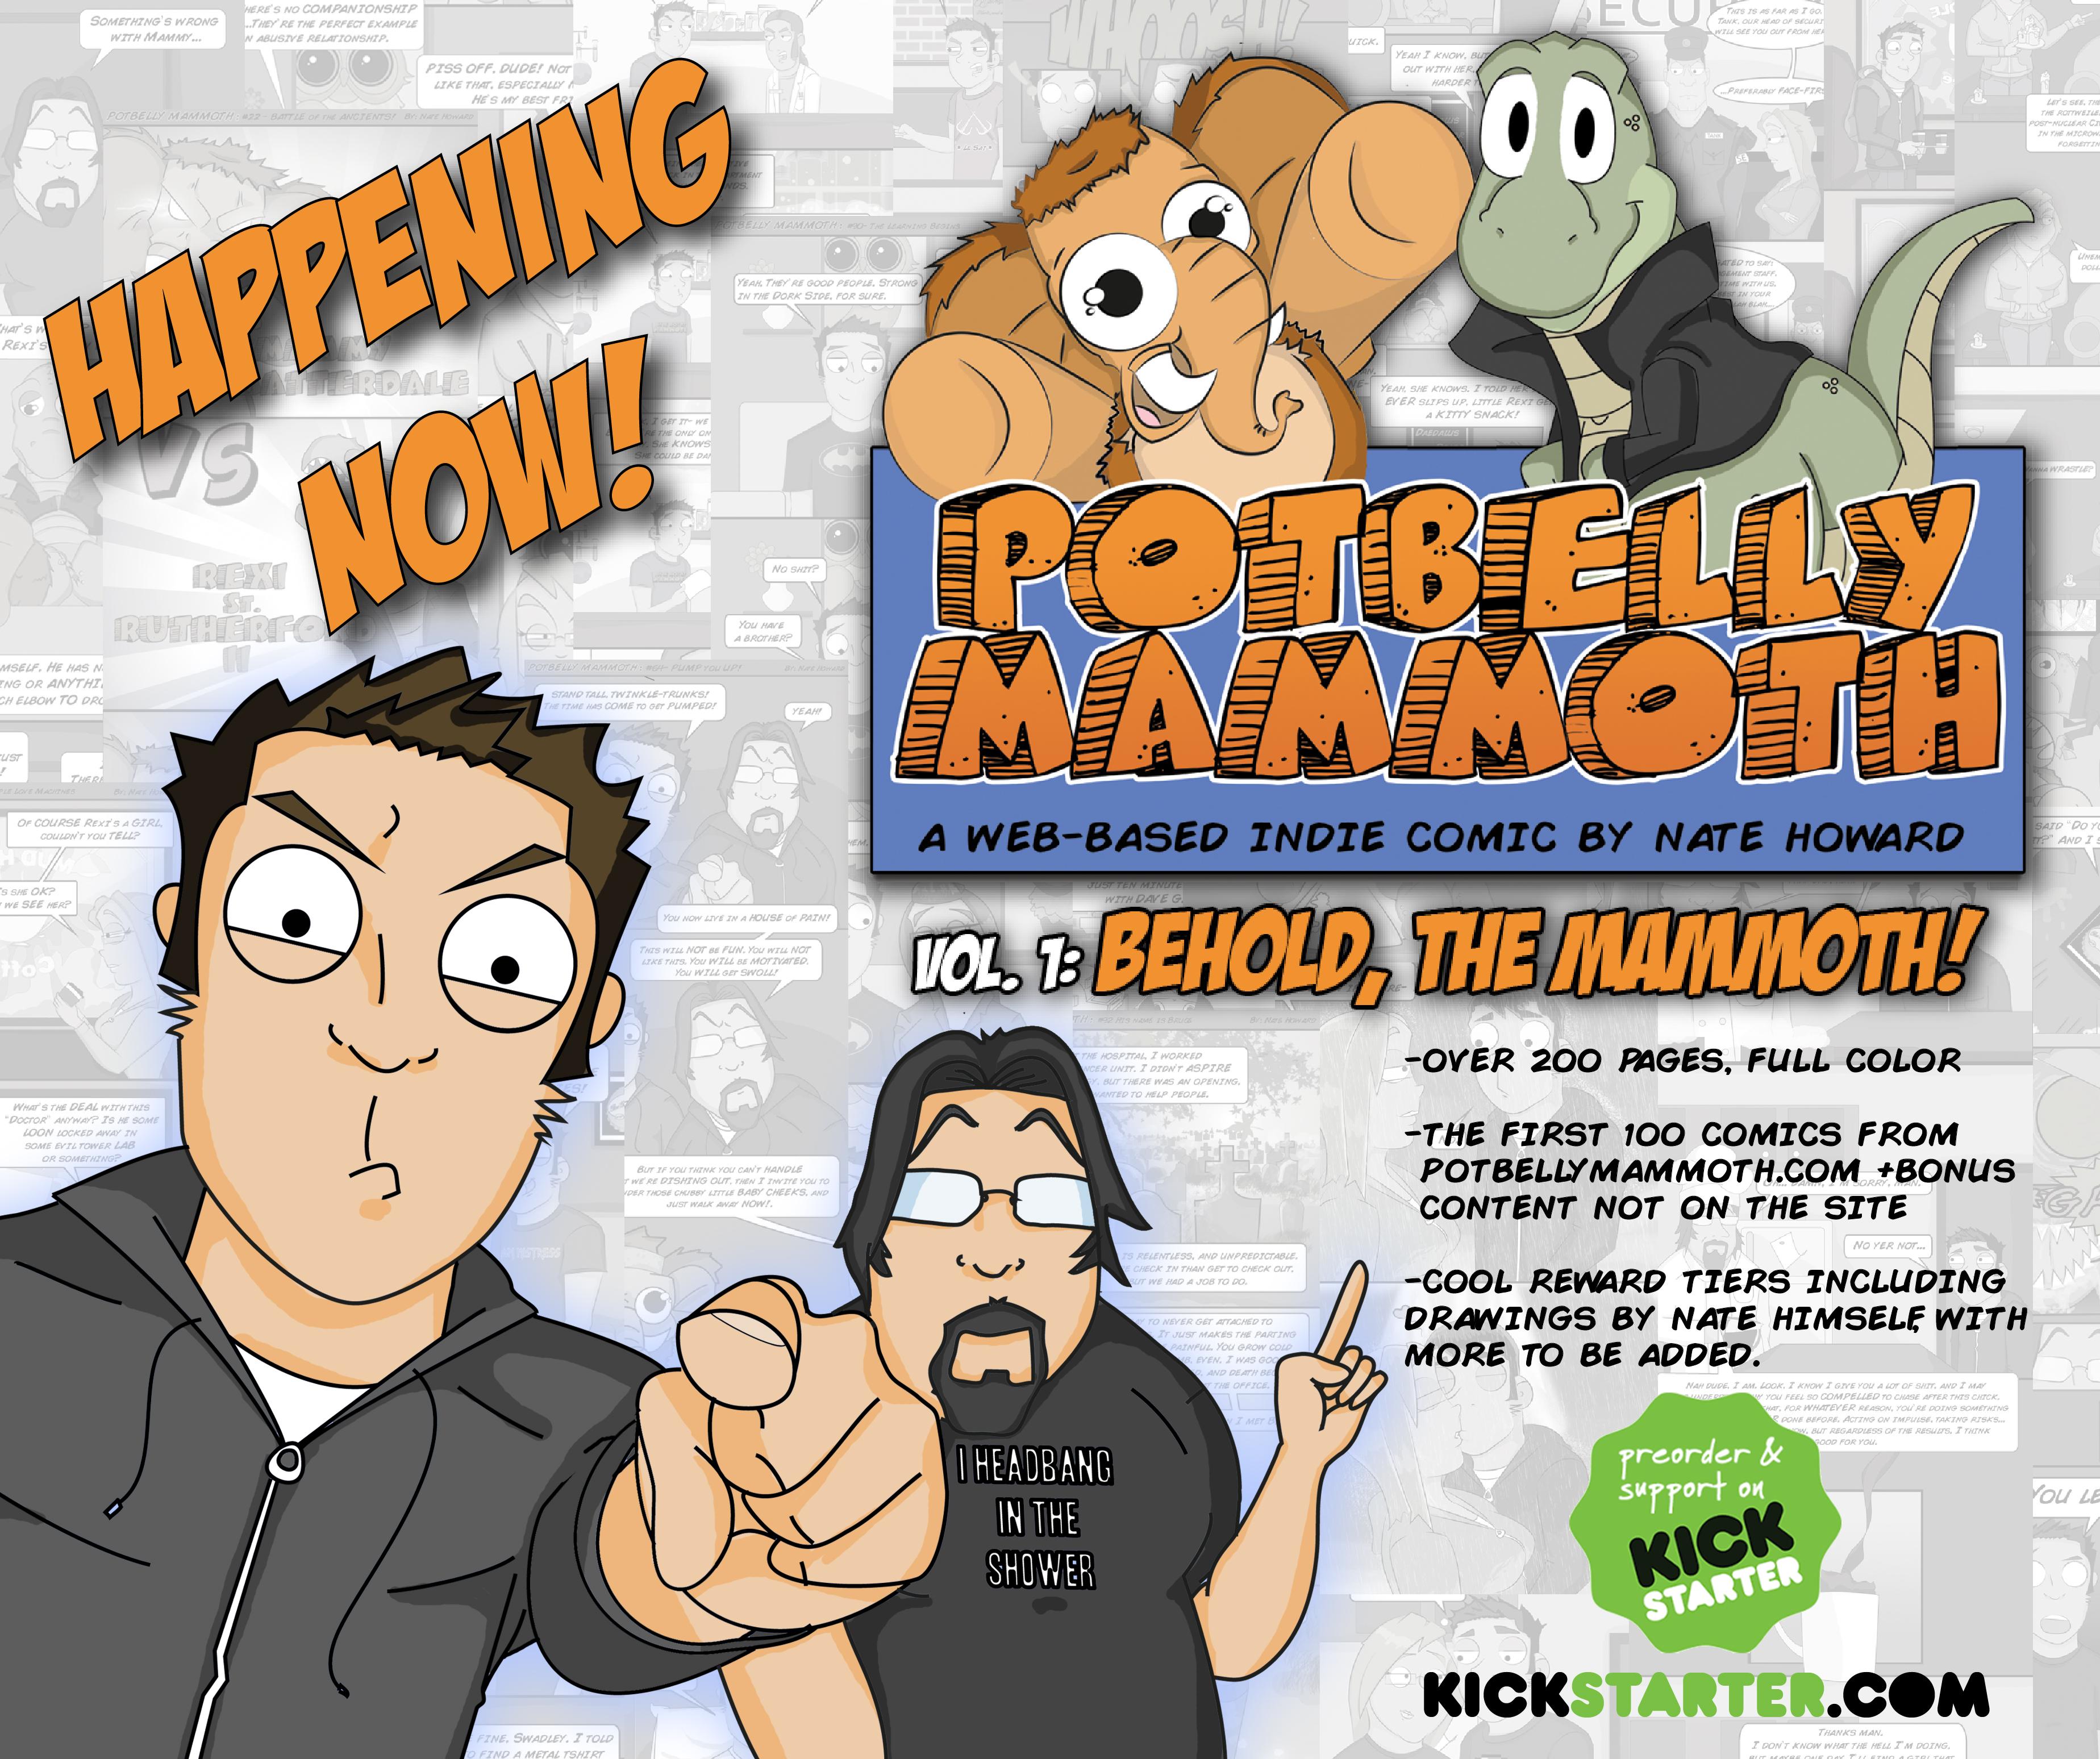 POTBELLY MAMMOTH vol.1: BEHOLD, THE MAMMOTH! on KICKSTARTER!